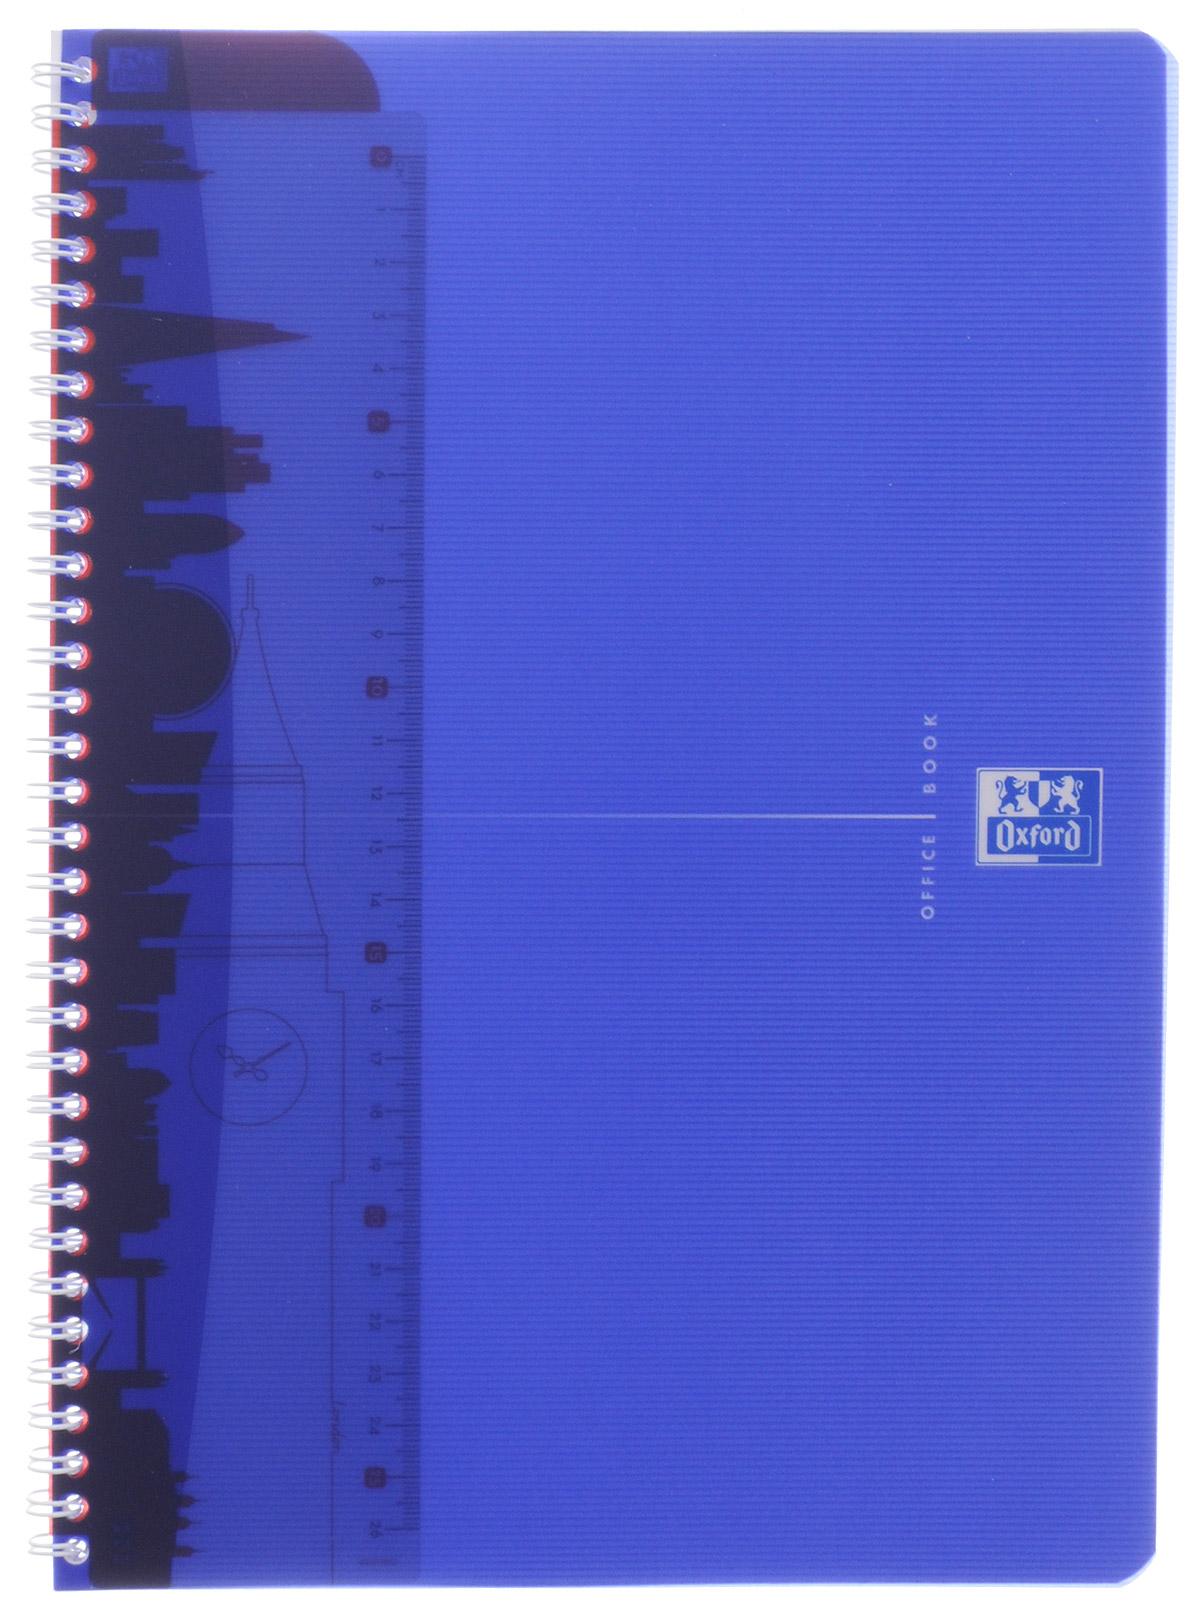 Oxford Тетрадь My Colours 50 листов в клетку цвет синий